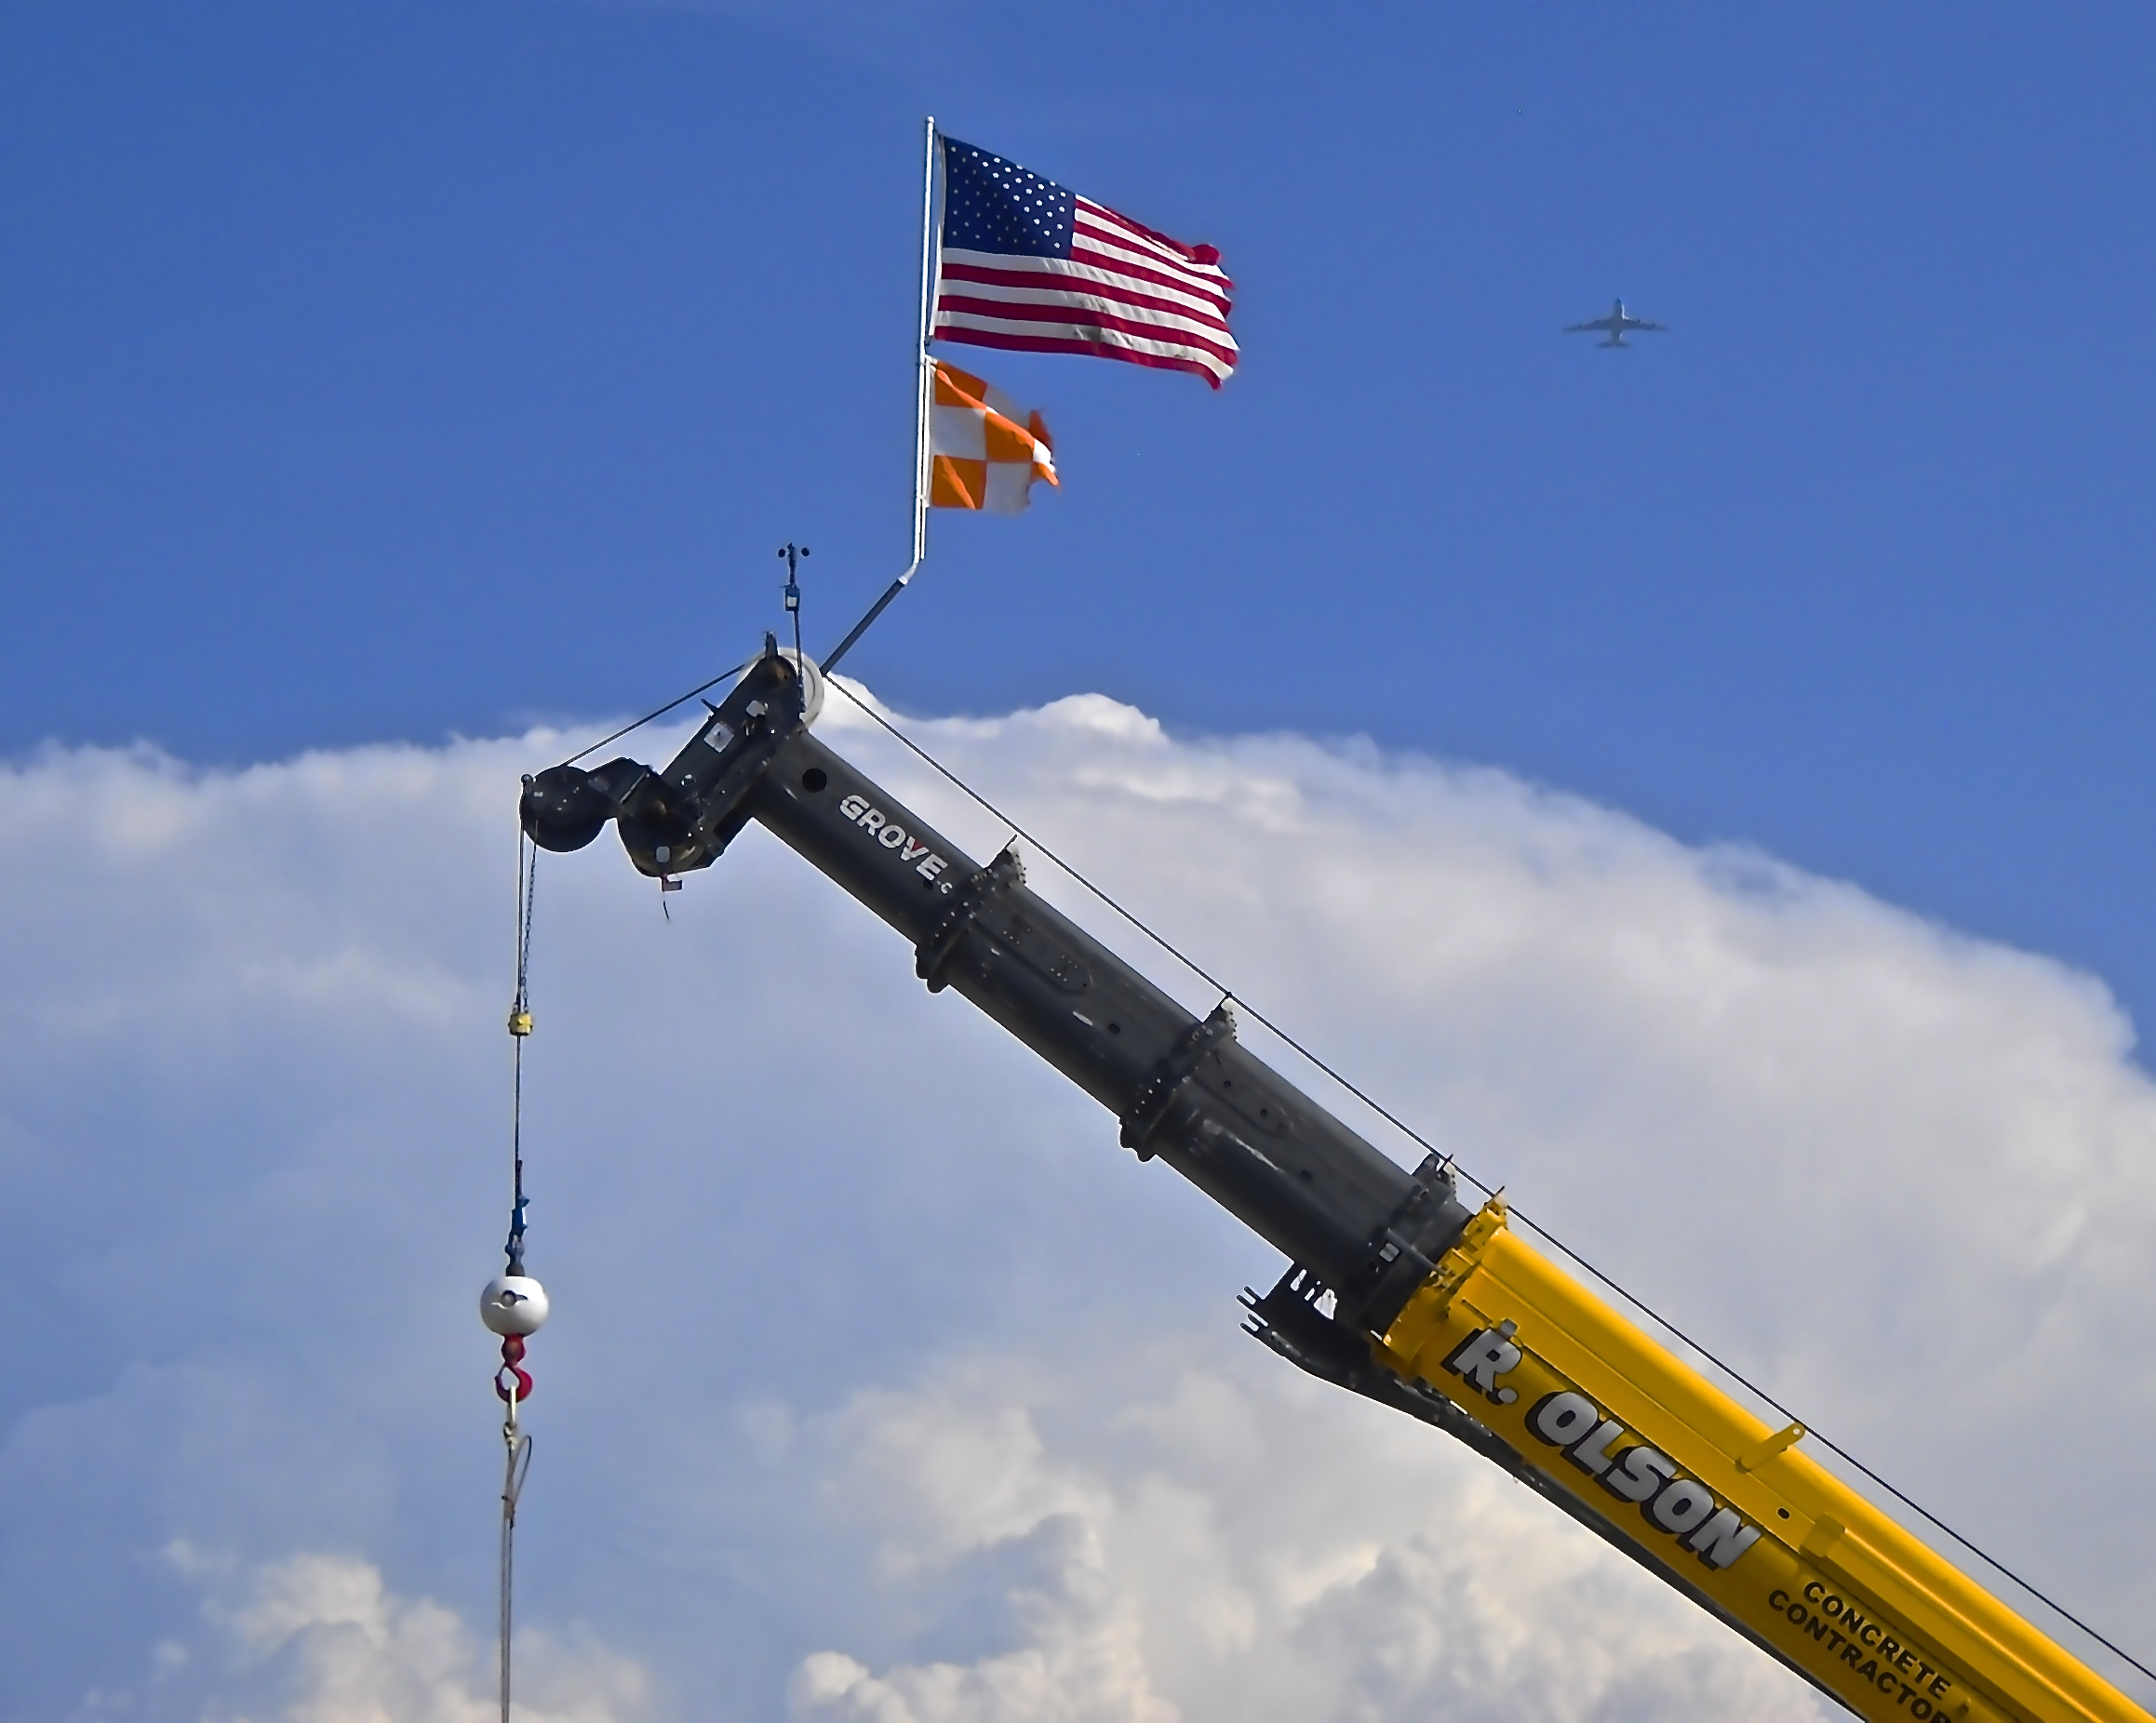 Olson Crane, Flag, and Airplane.jpg